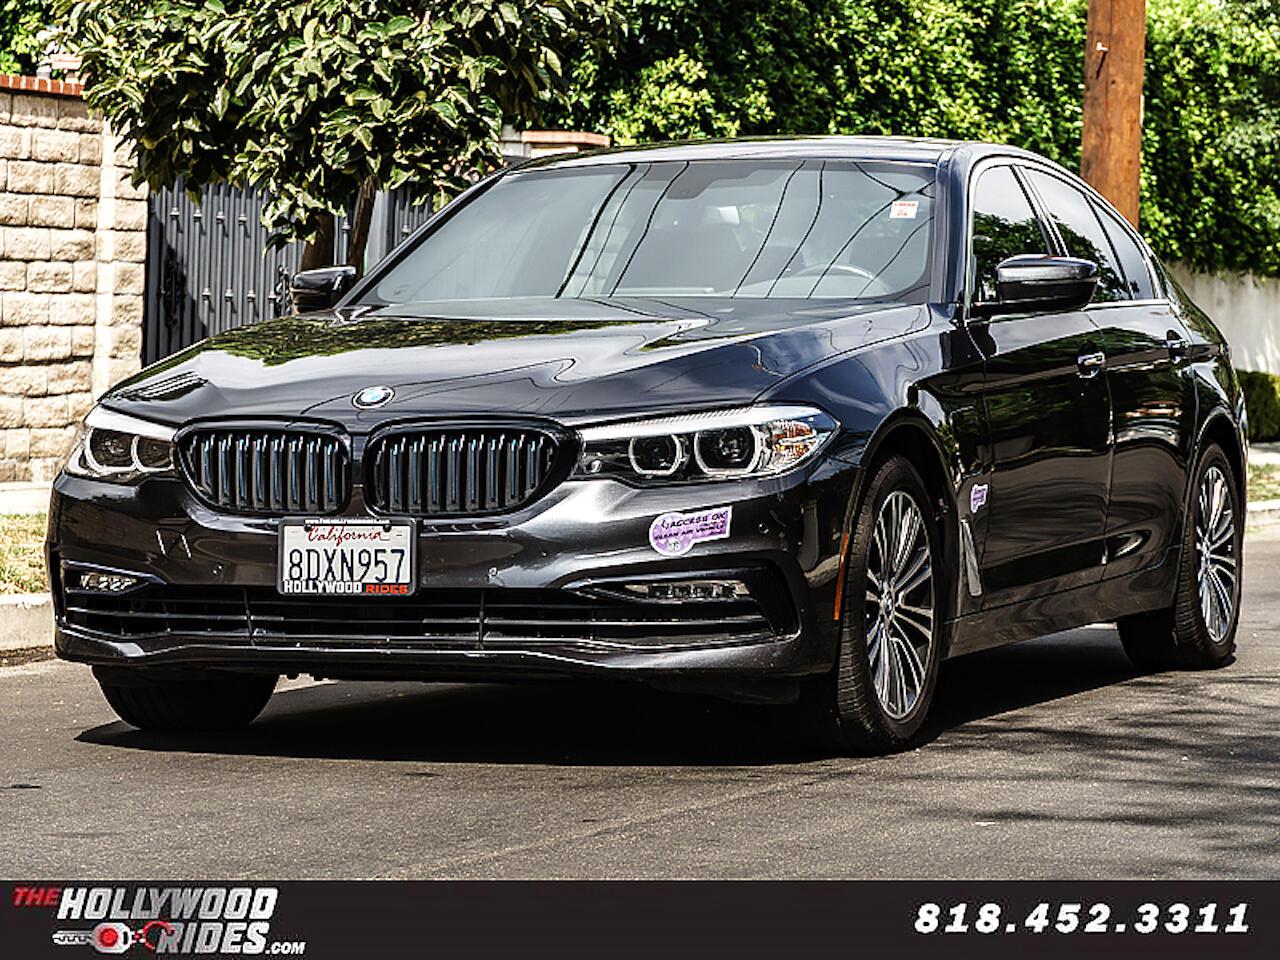 BMW 5-Series 530e iPerformance 2018